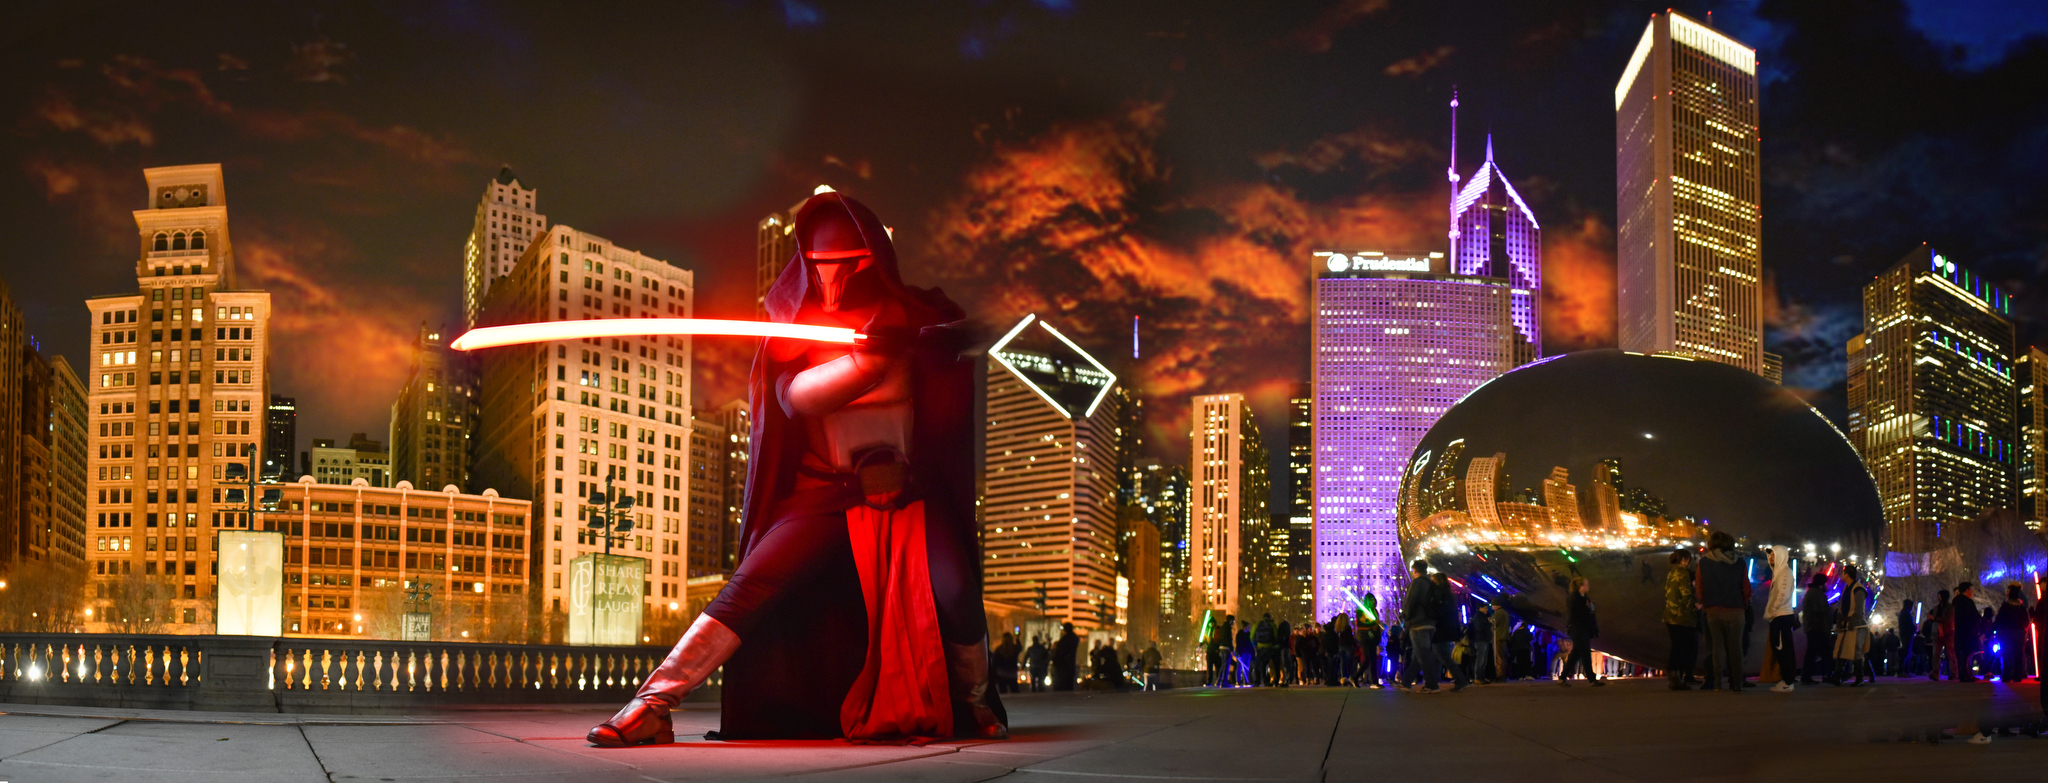 2019.04.14 - Star Wars Celebration Chicago 288844.JPG